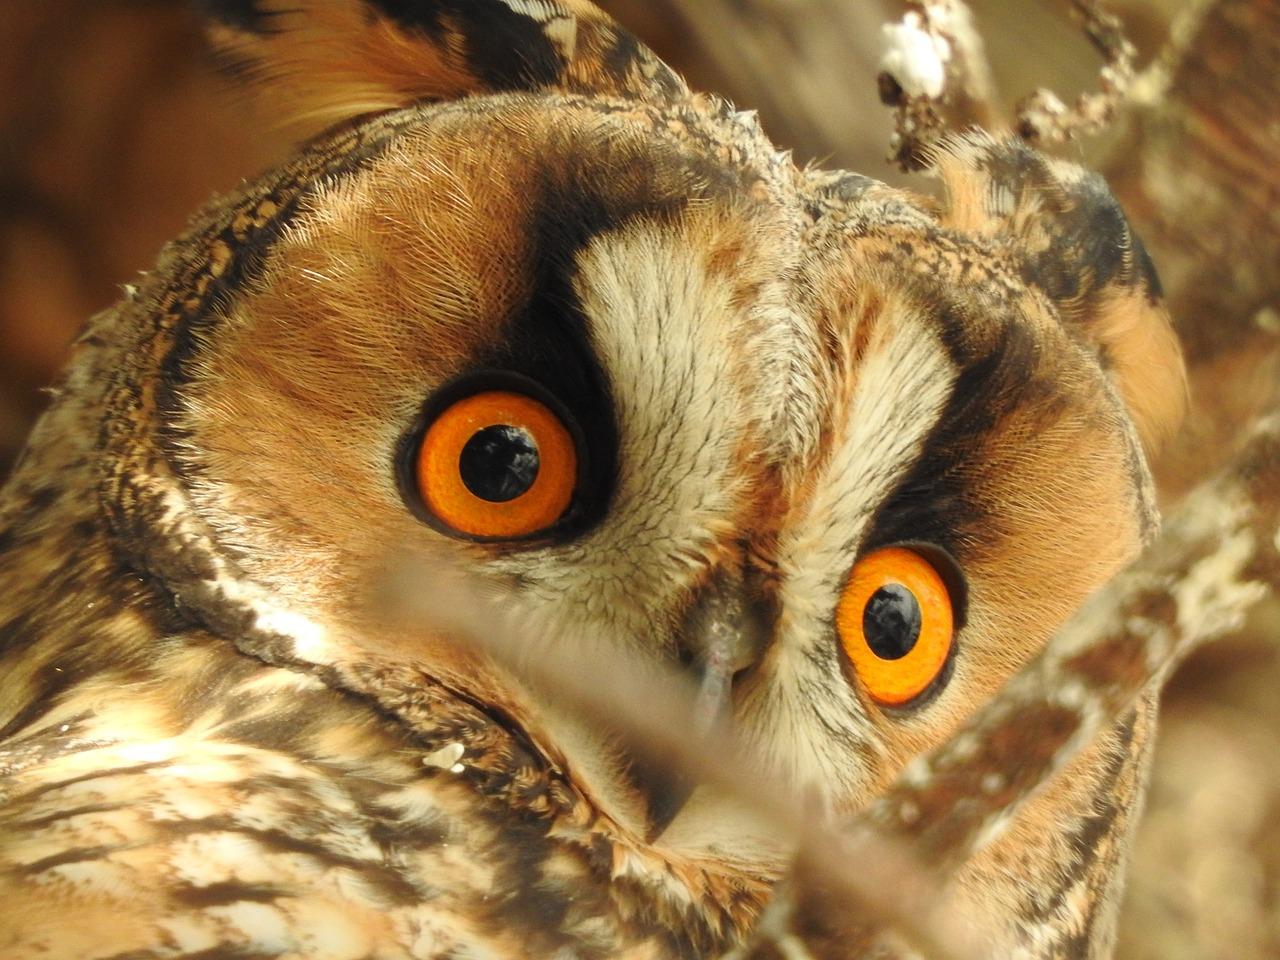 owl-5188242_1280.jpg